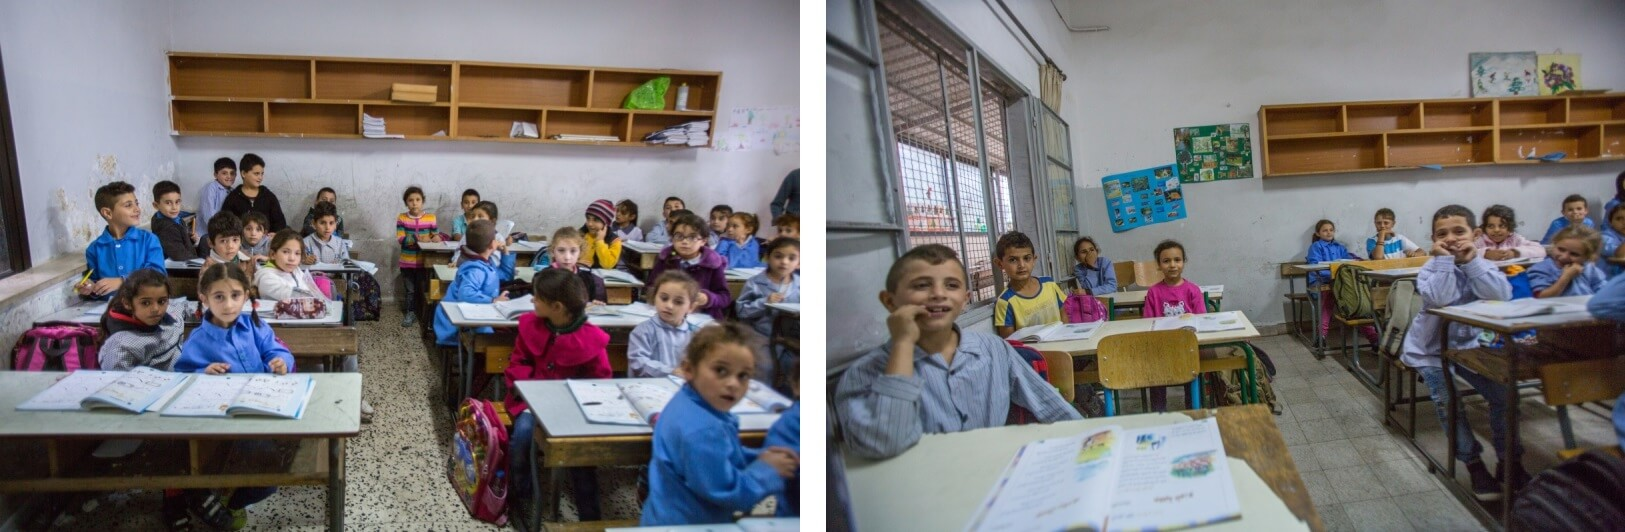 skola Libanon